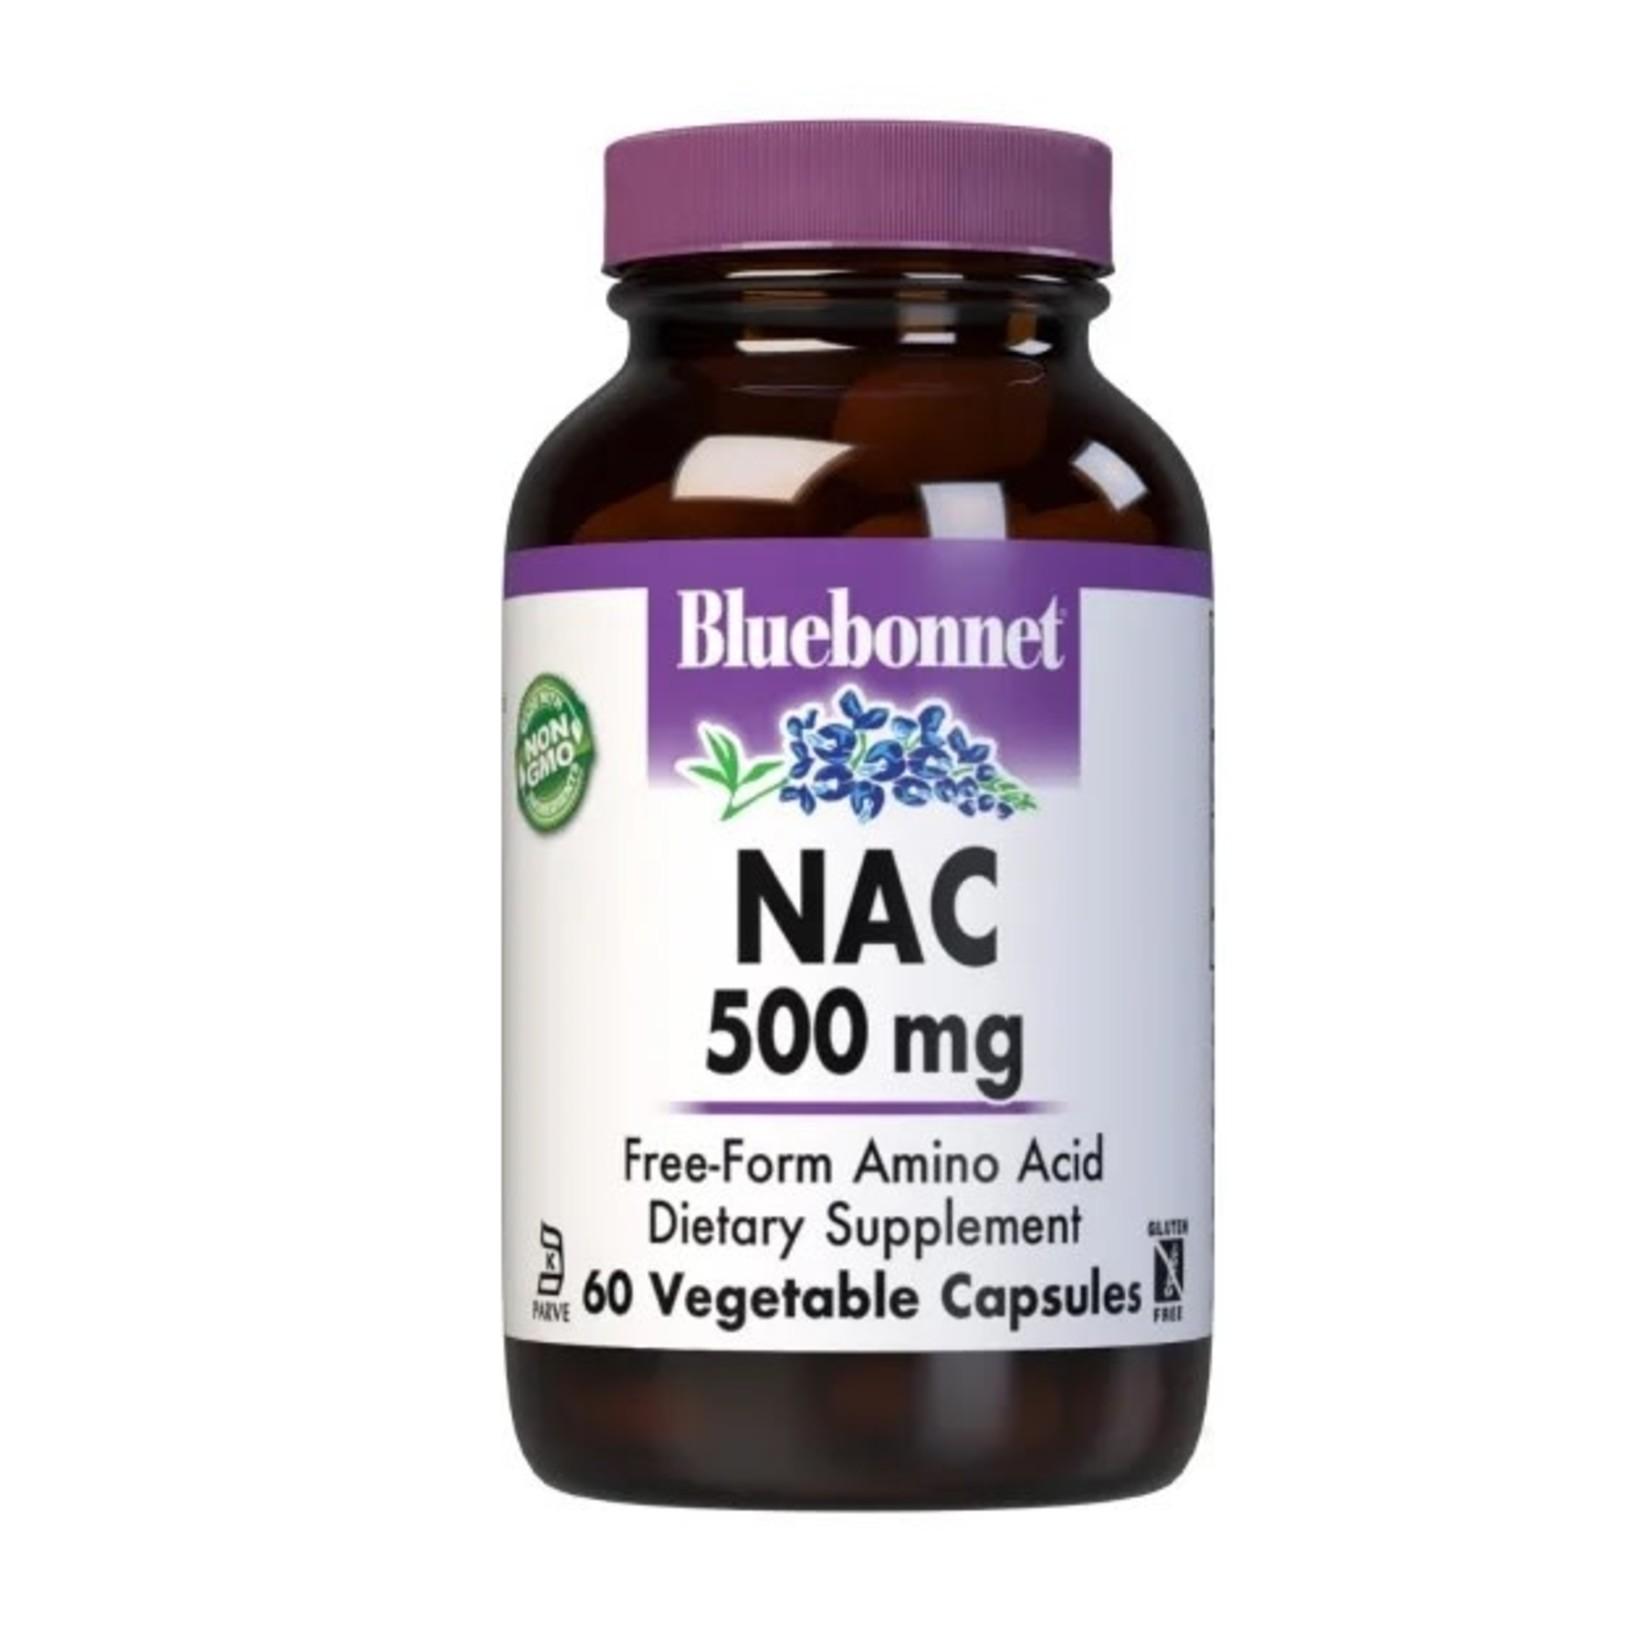 BlueBonnet Bluebonnet NAC 500mg 60 Vegetable Capsules